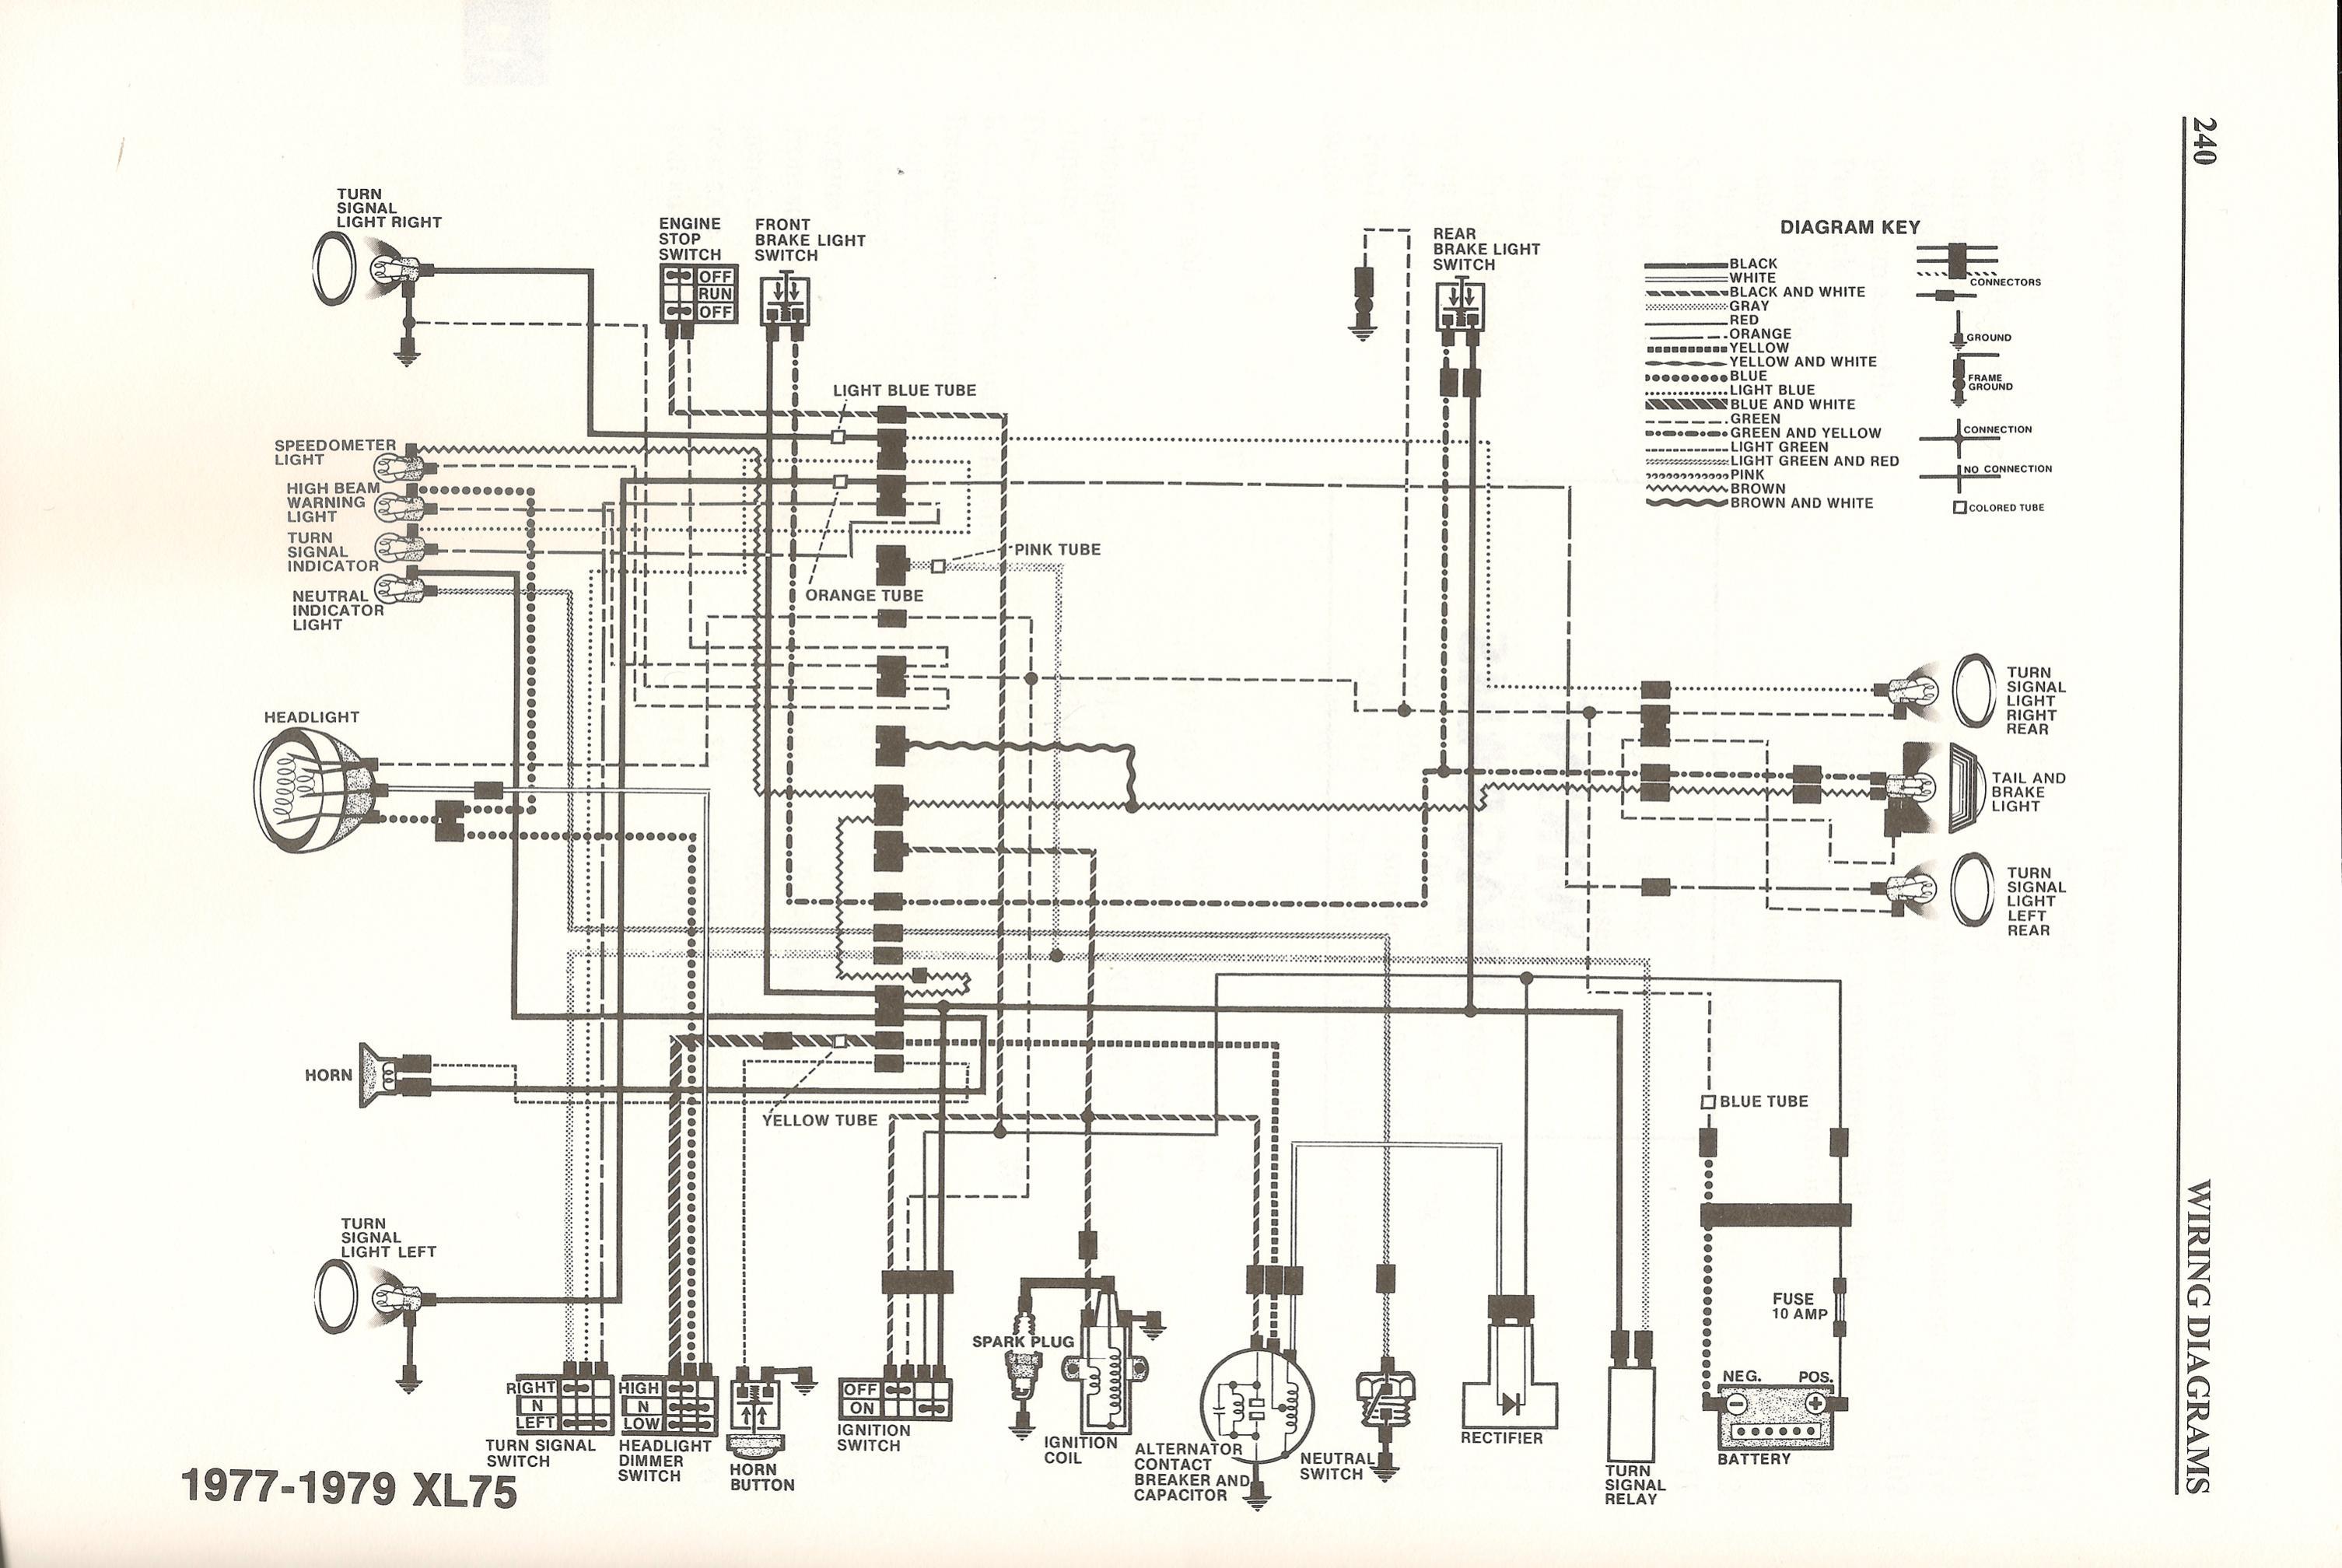 Honda Xr75 Wiring Great Design Of Diagram Xl350 Electrical Diagrams For A 1977 U2022 1978